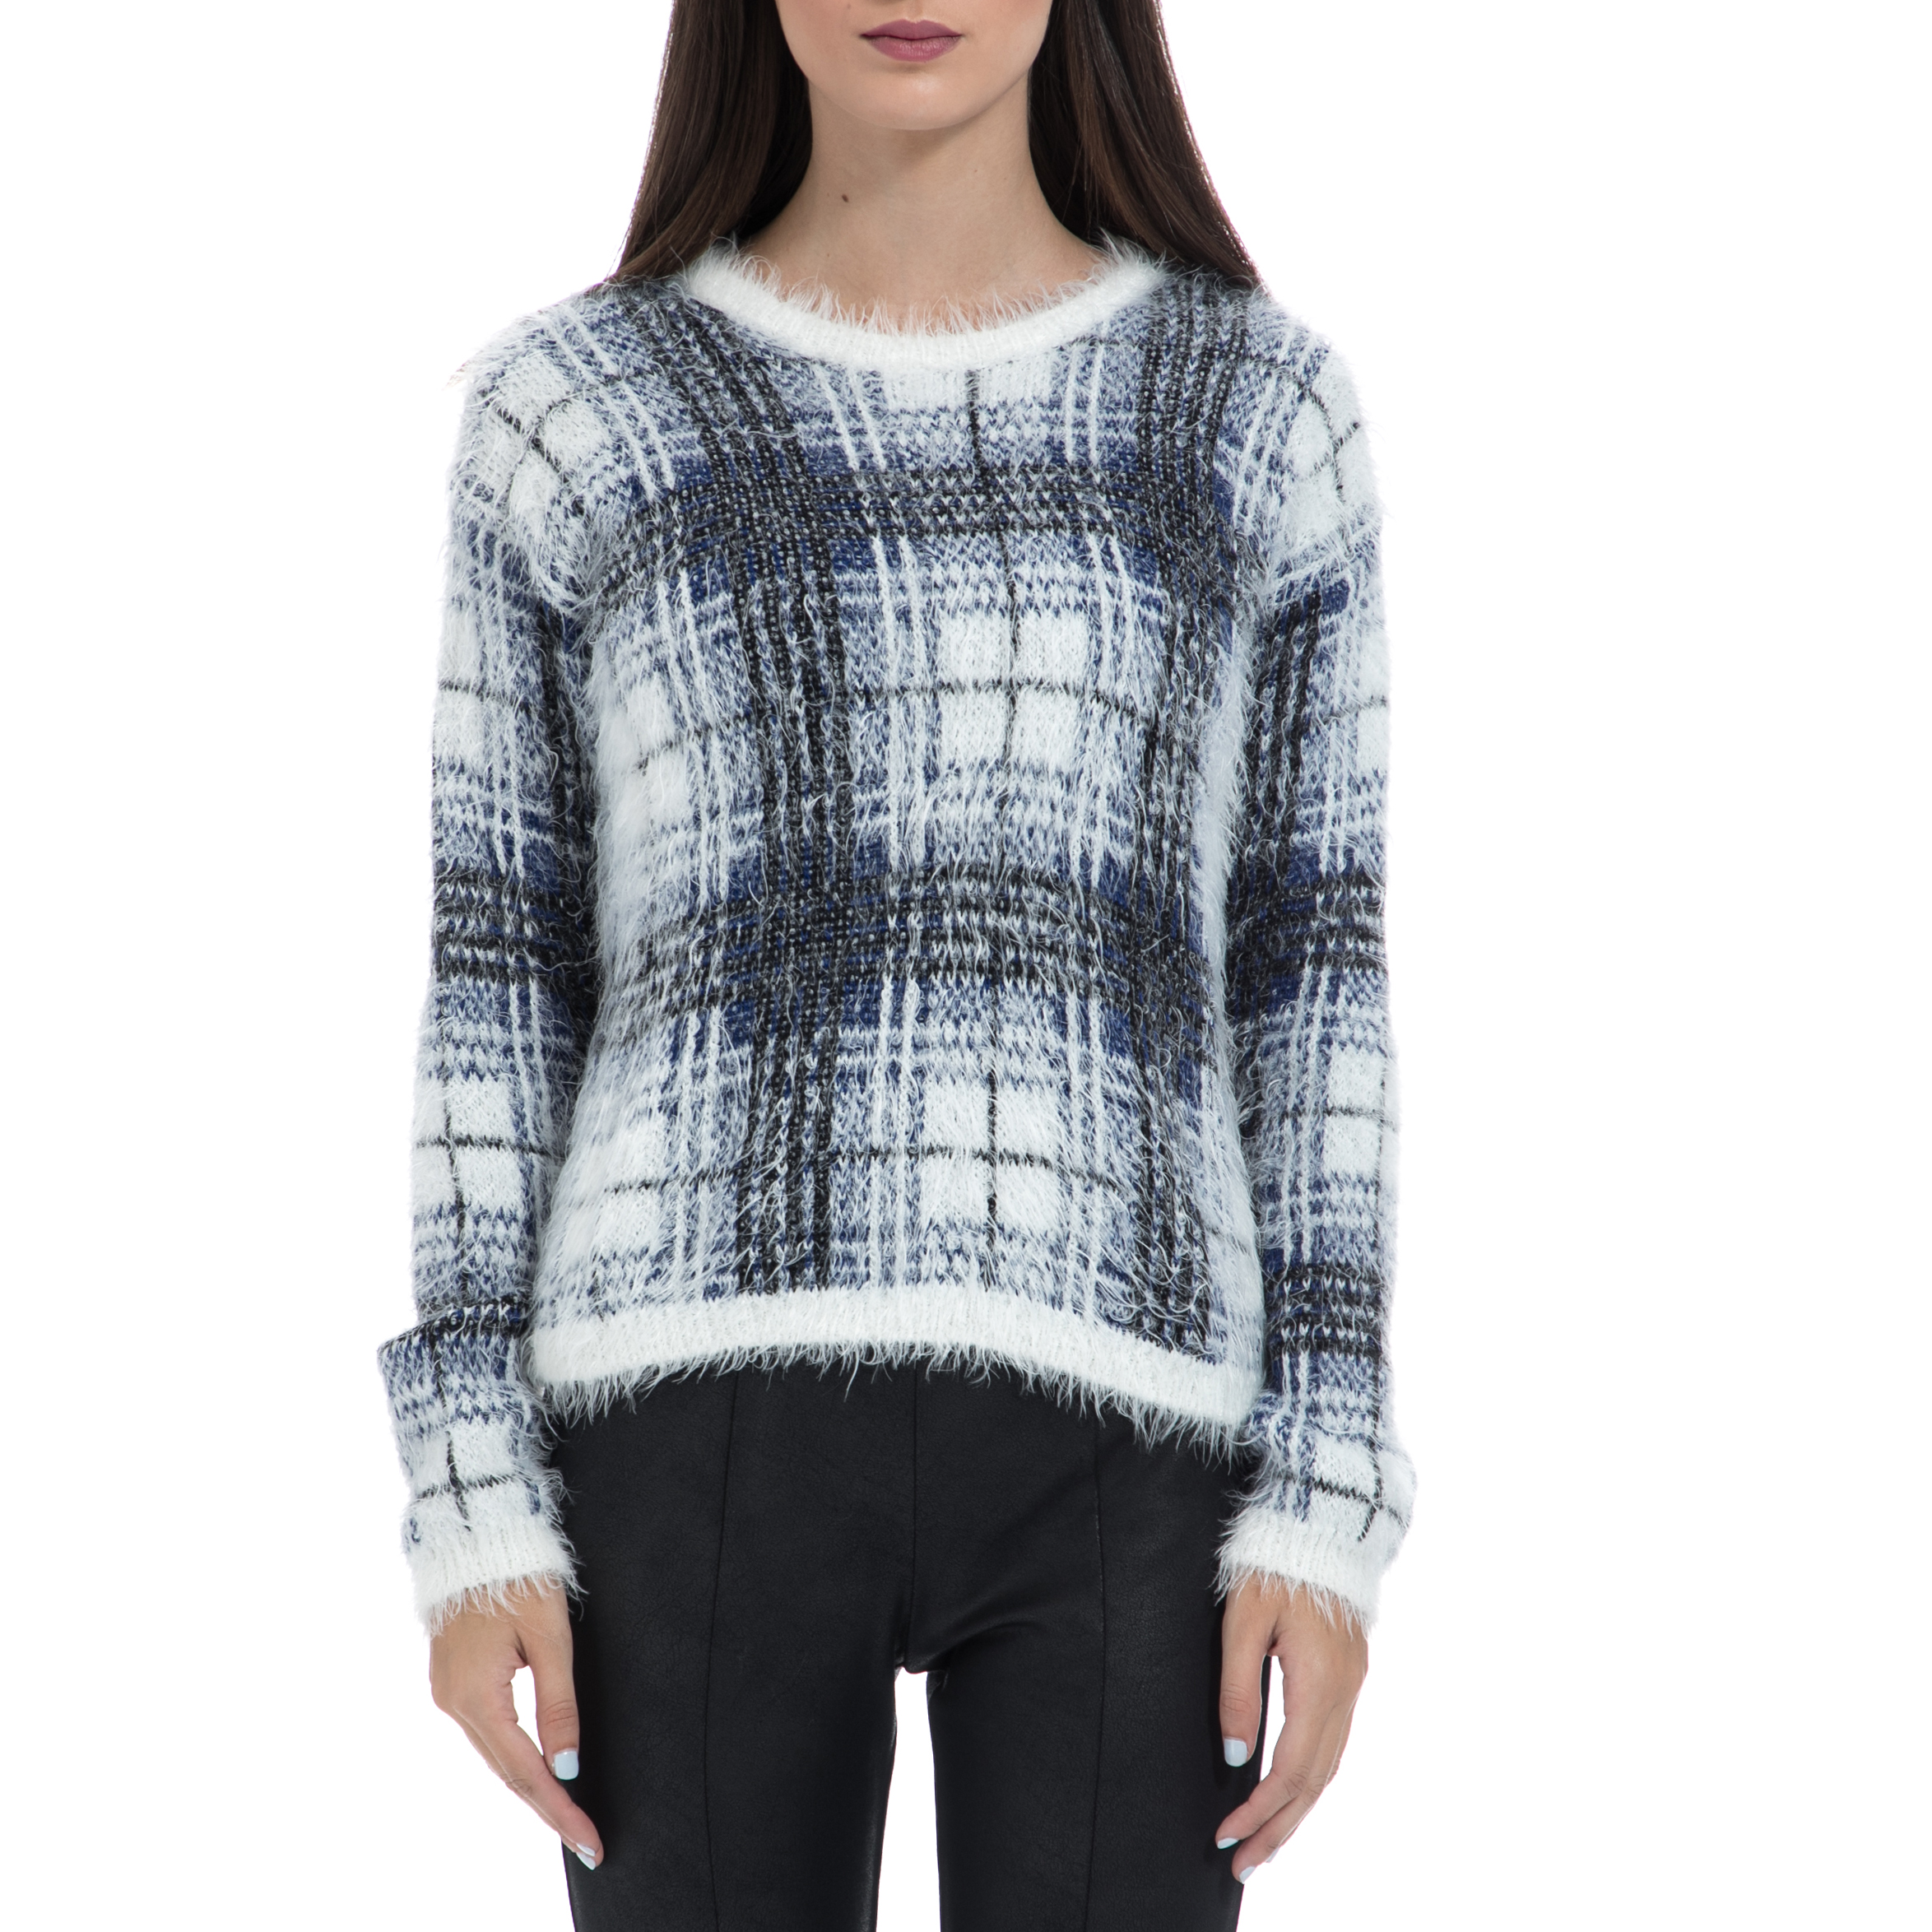 GAS - Γυναικείο πουλόβερ GAS καρό γυναικεία ρούχα πλεκτά ζακέτες πουλόβερ